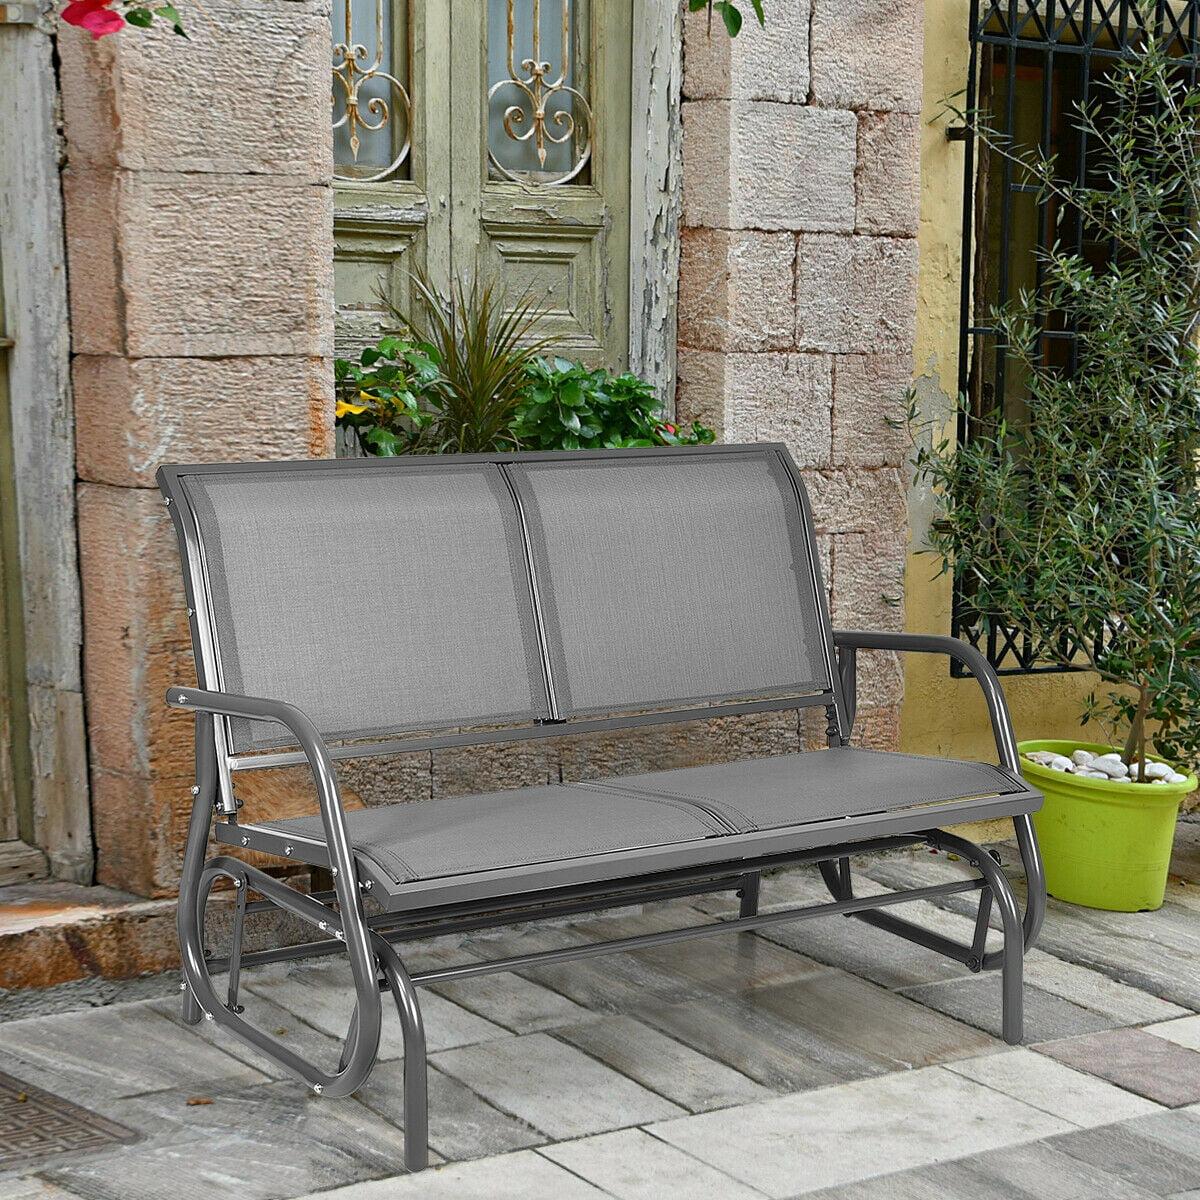 gymax 48 outdoor patio swing glider bench chair loveseat rocker lounge backyard grey